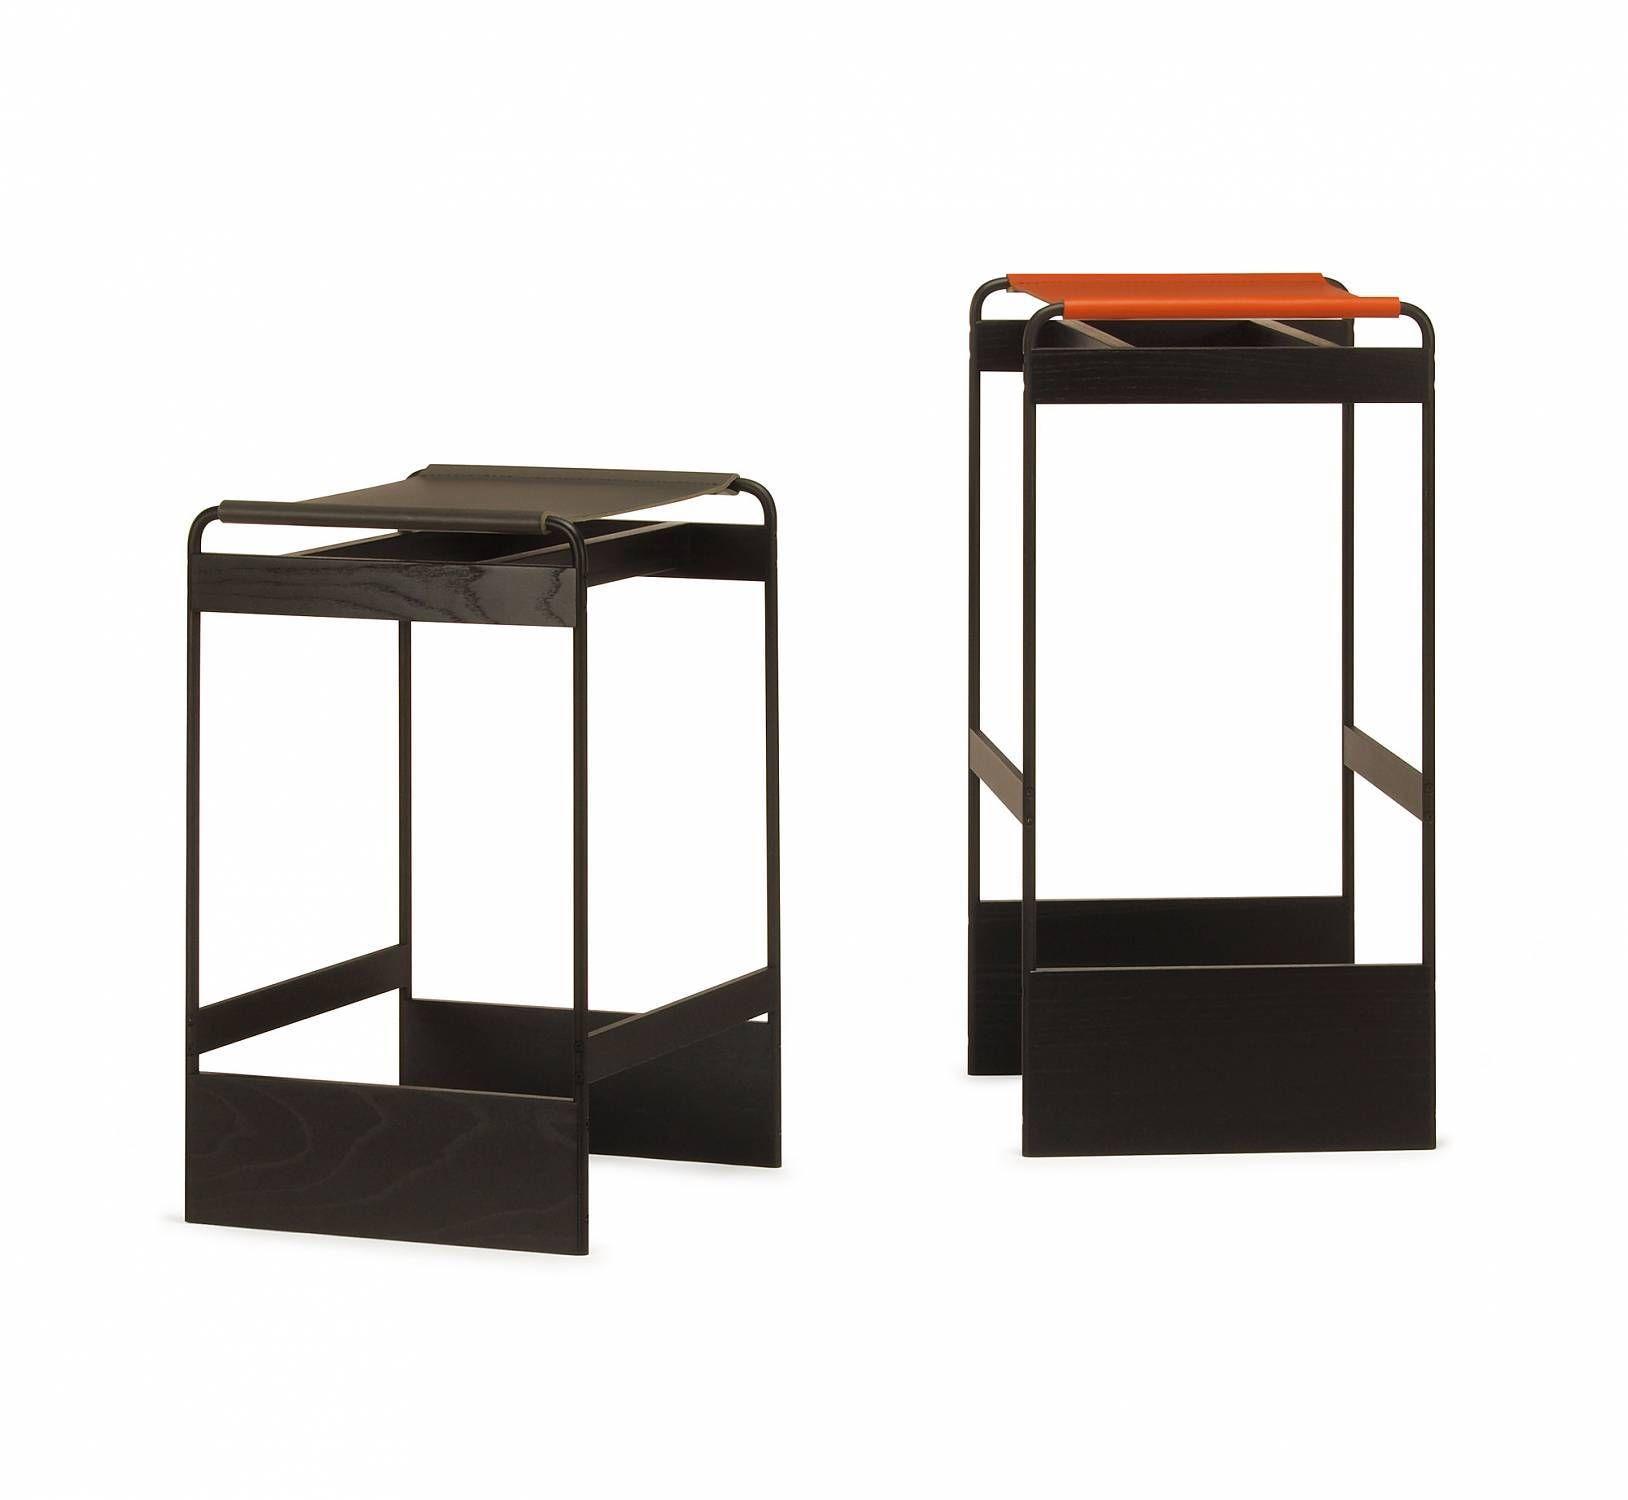 cutting edge furniture. Skram Furniture Company Craft Their Products Using \u0027traditional Techniques \u0026 Cutting-edge Fabrication\u0027 Cutting Edge C